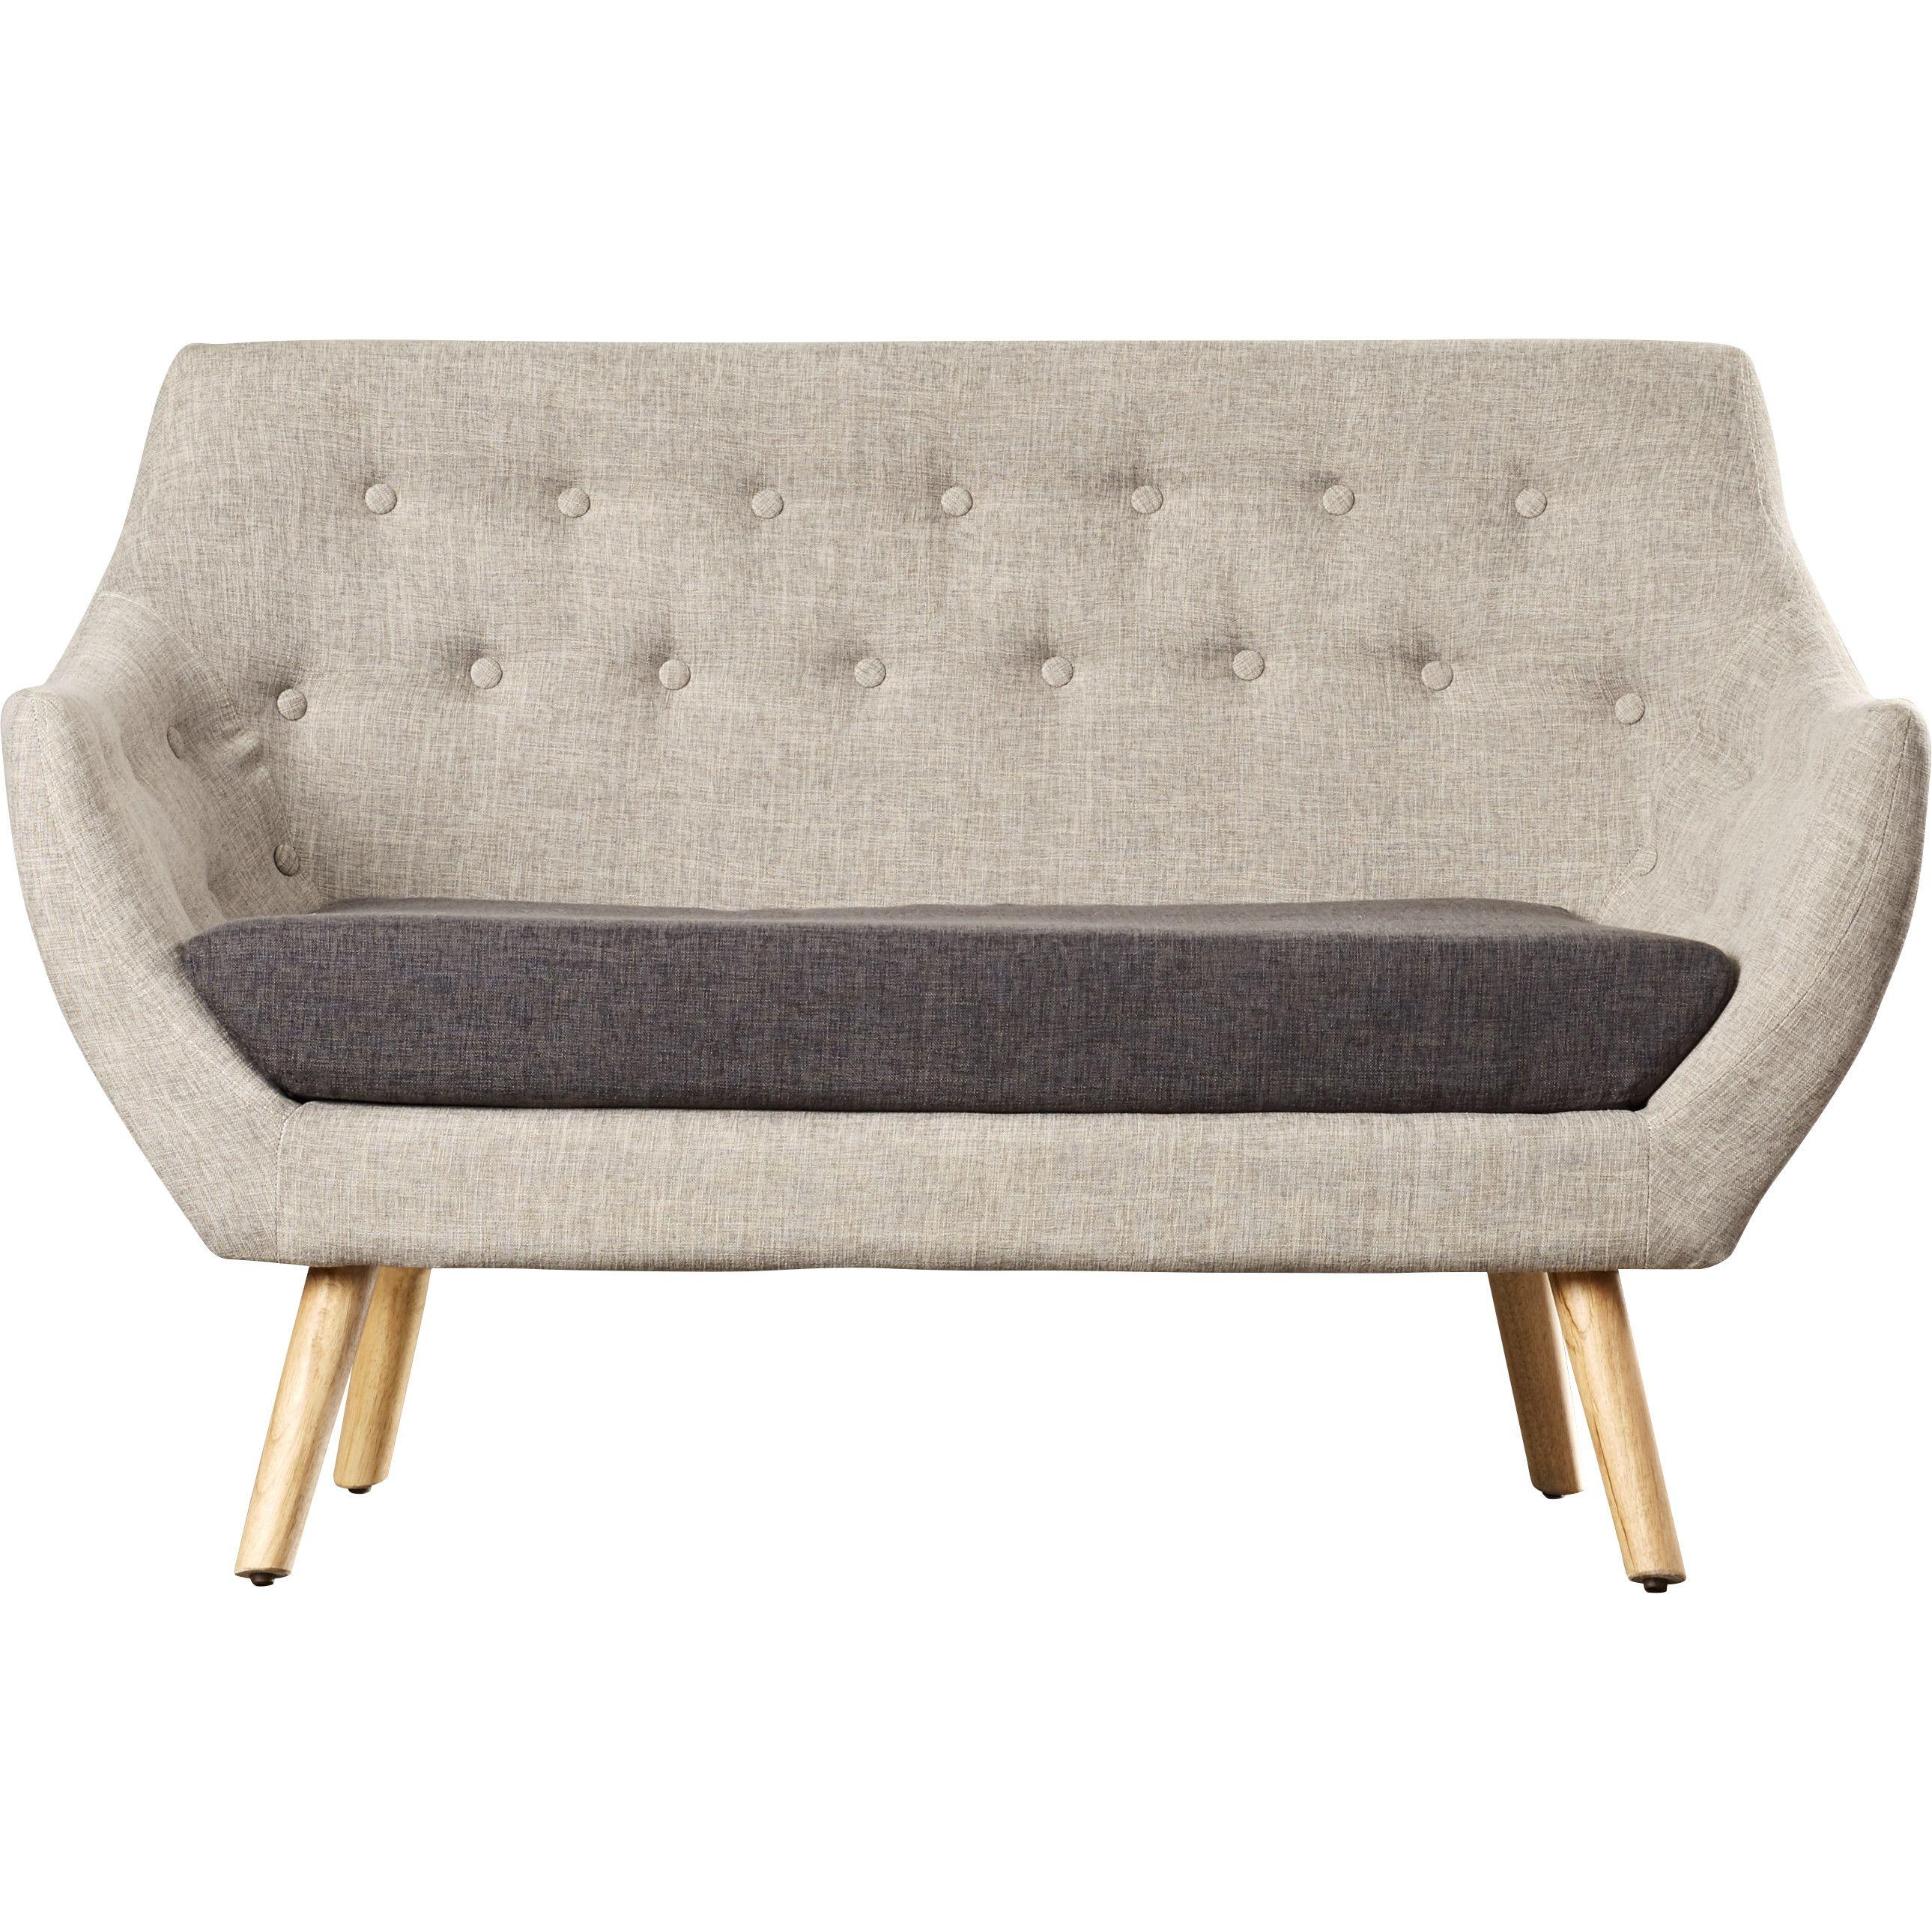 Laude Run Zack Mid Century Fabric Loveseat Furniture Pingoffice